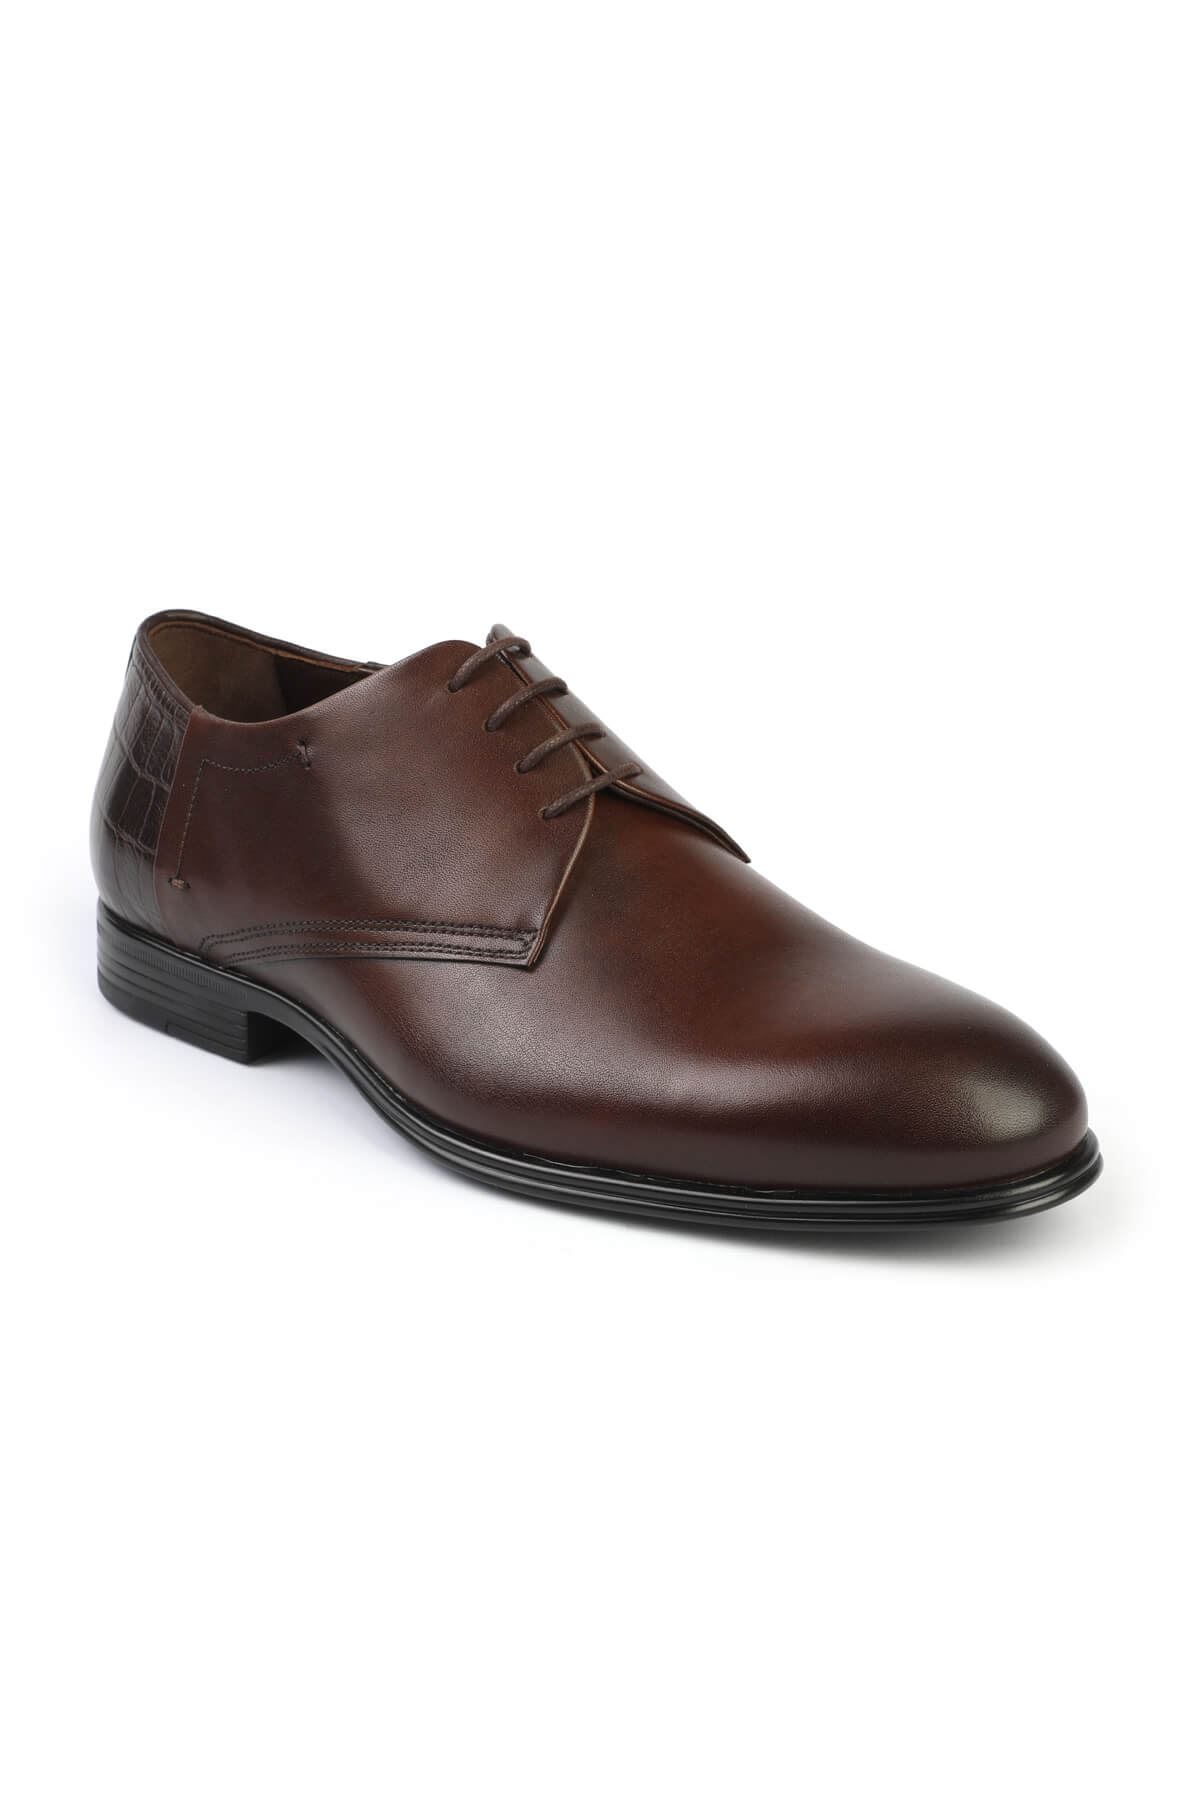 Libero 3111 Brown Classic Shoes